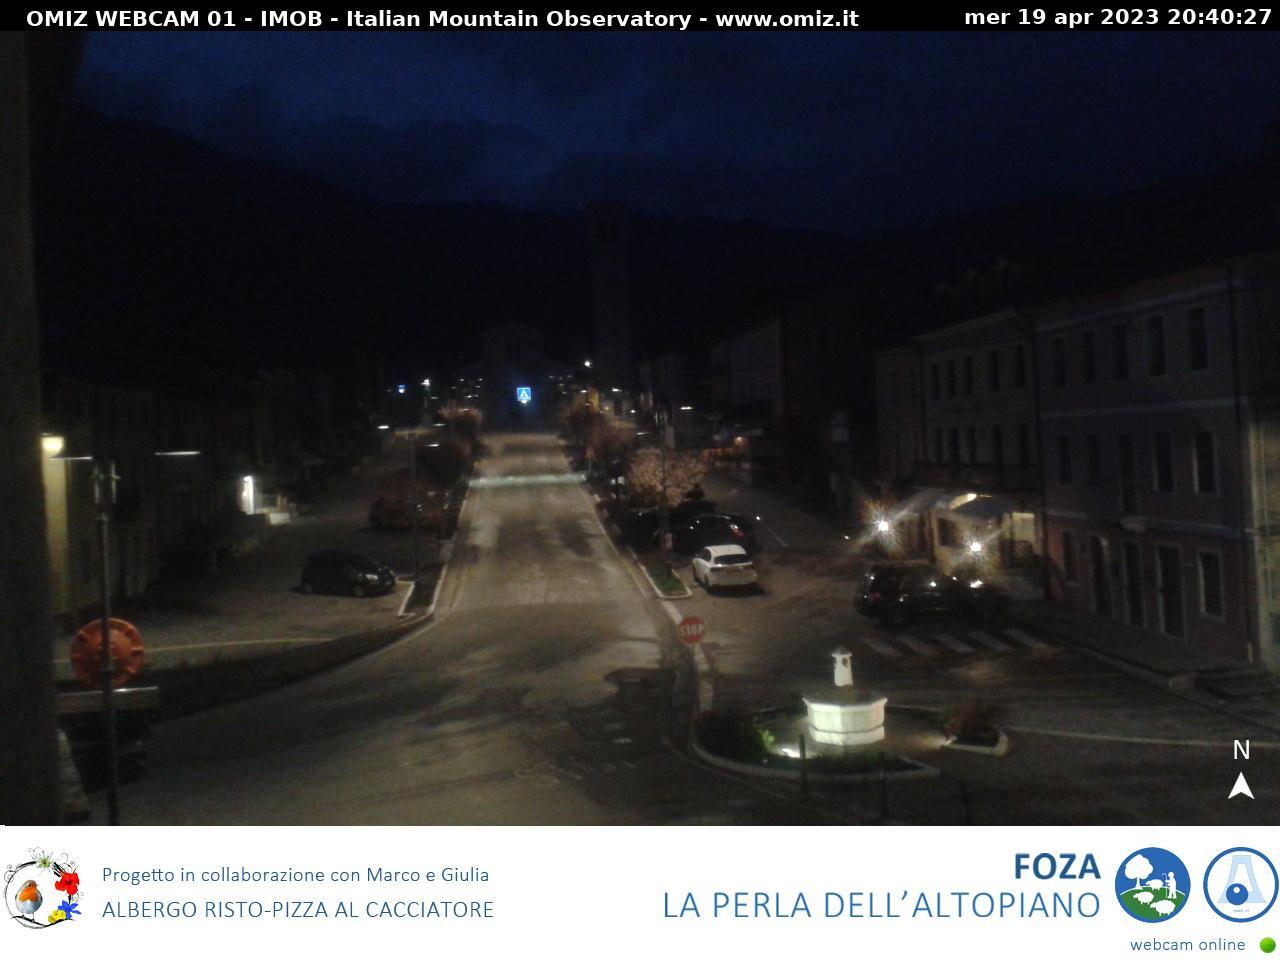 Foza Livecam 1